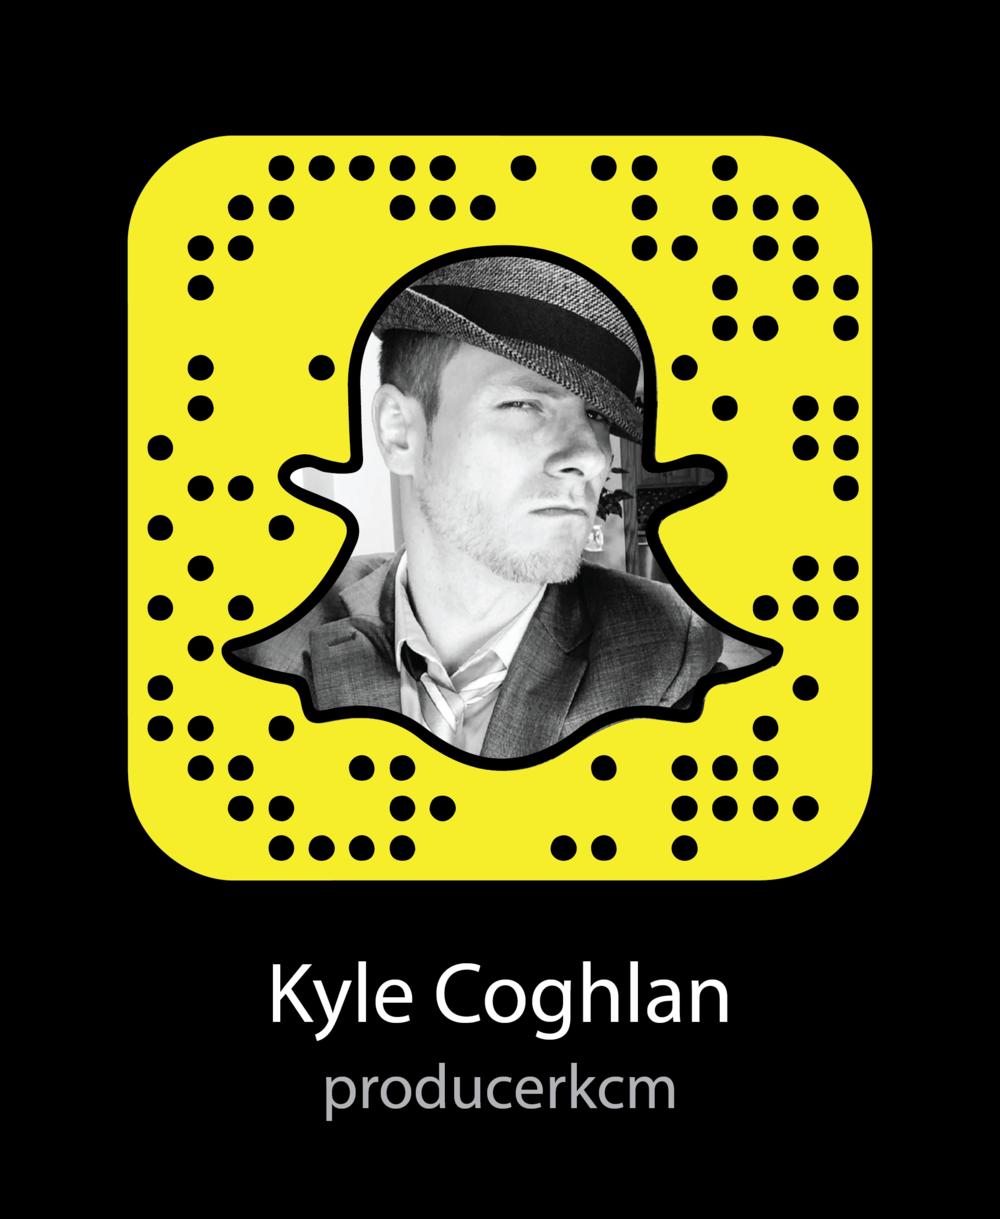 producer-kcm-storytellers-snapchat-snapcode.png